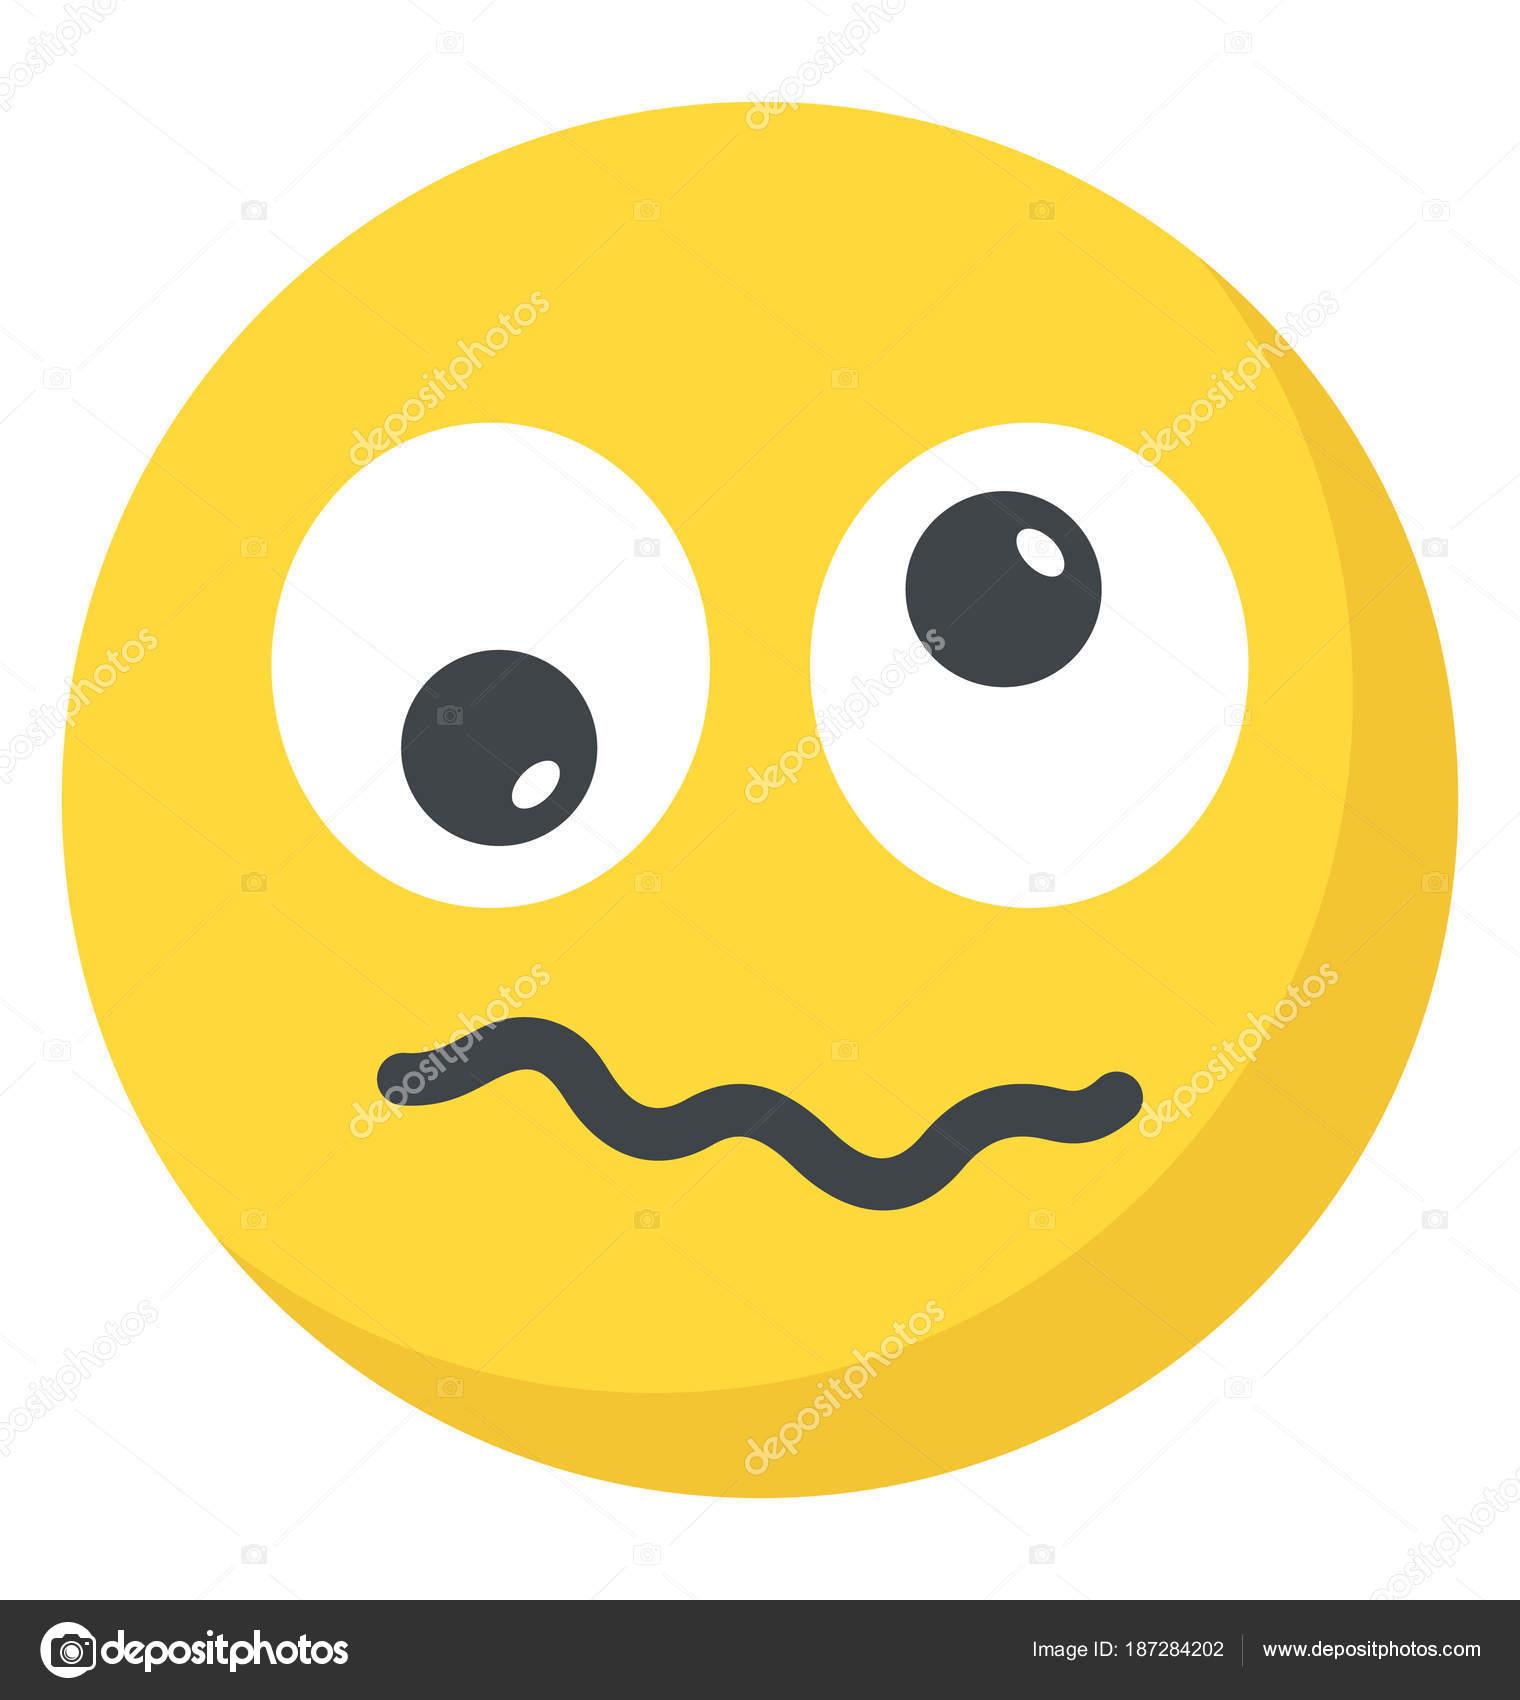 confused emoji face images